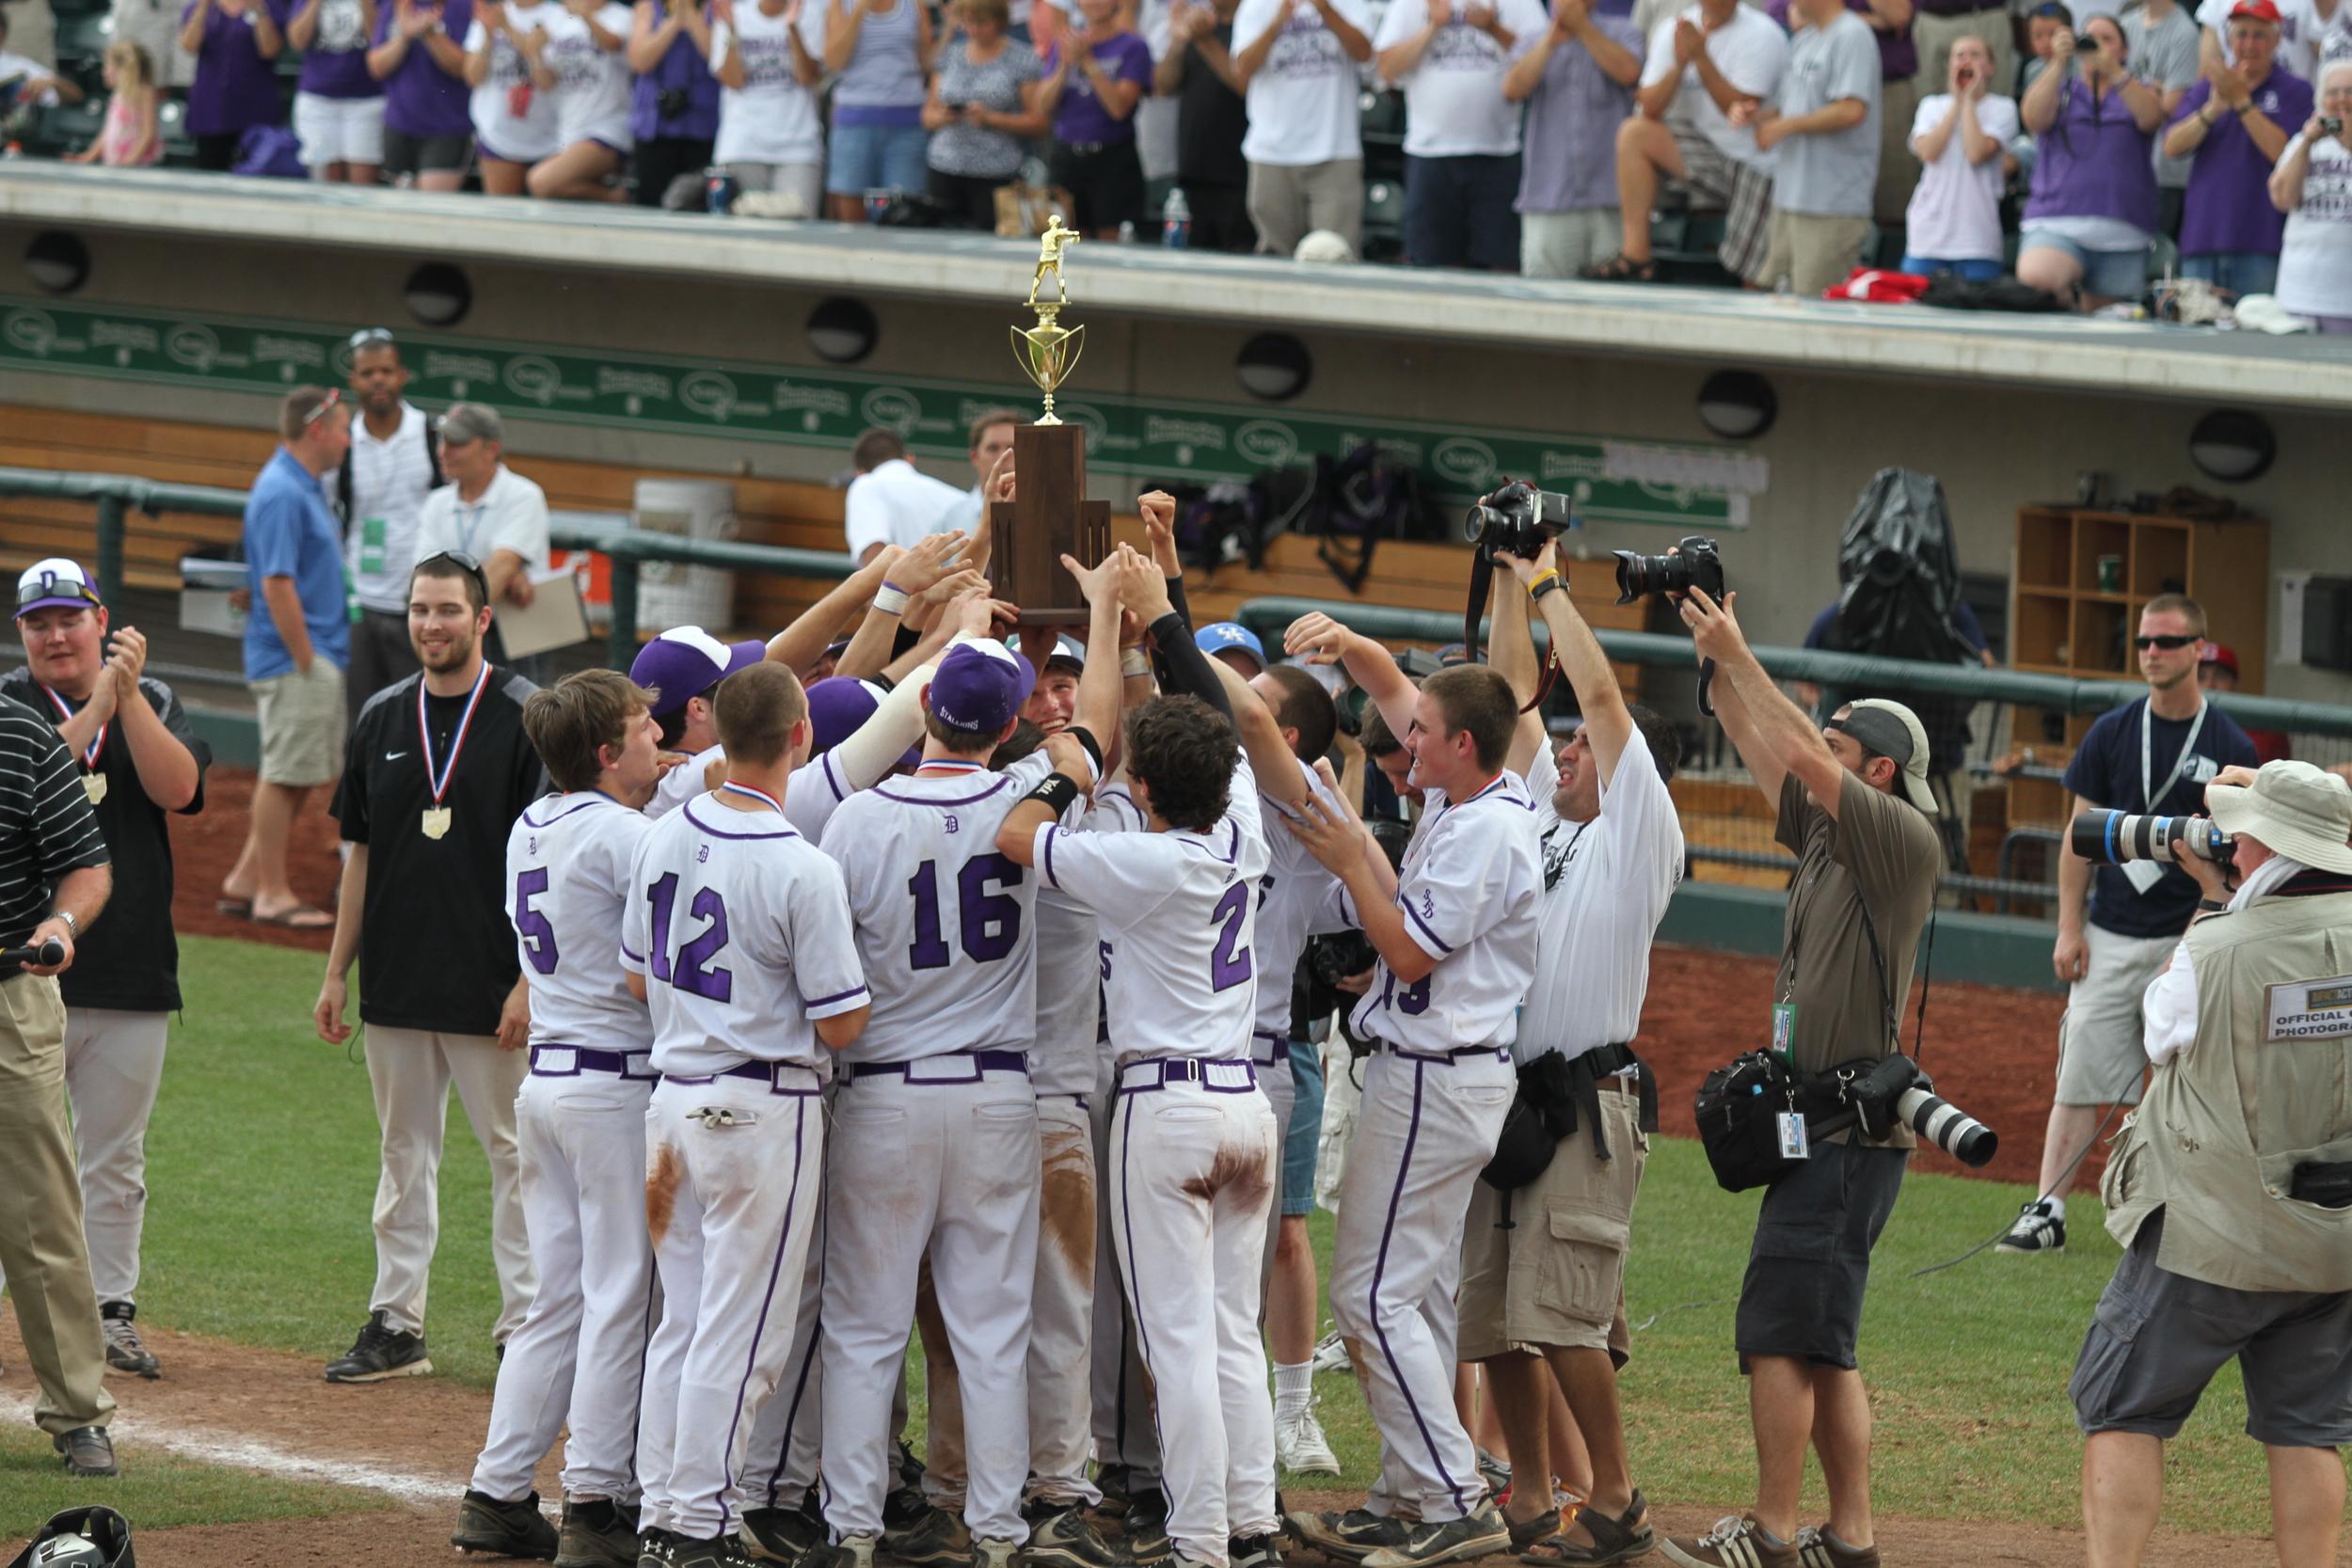 The Stallions hoist the trophy!